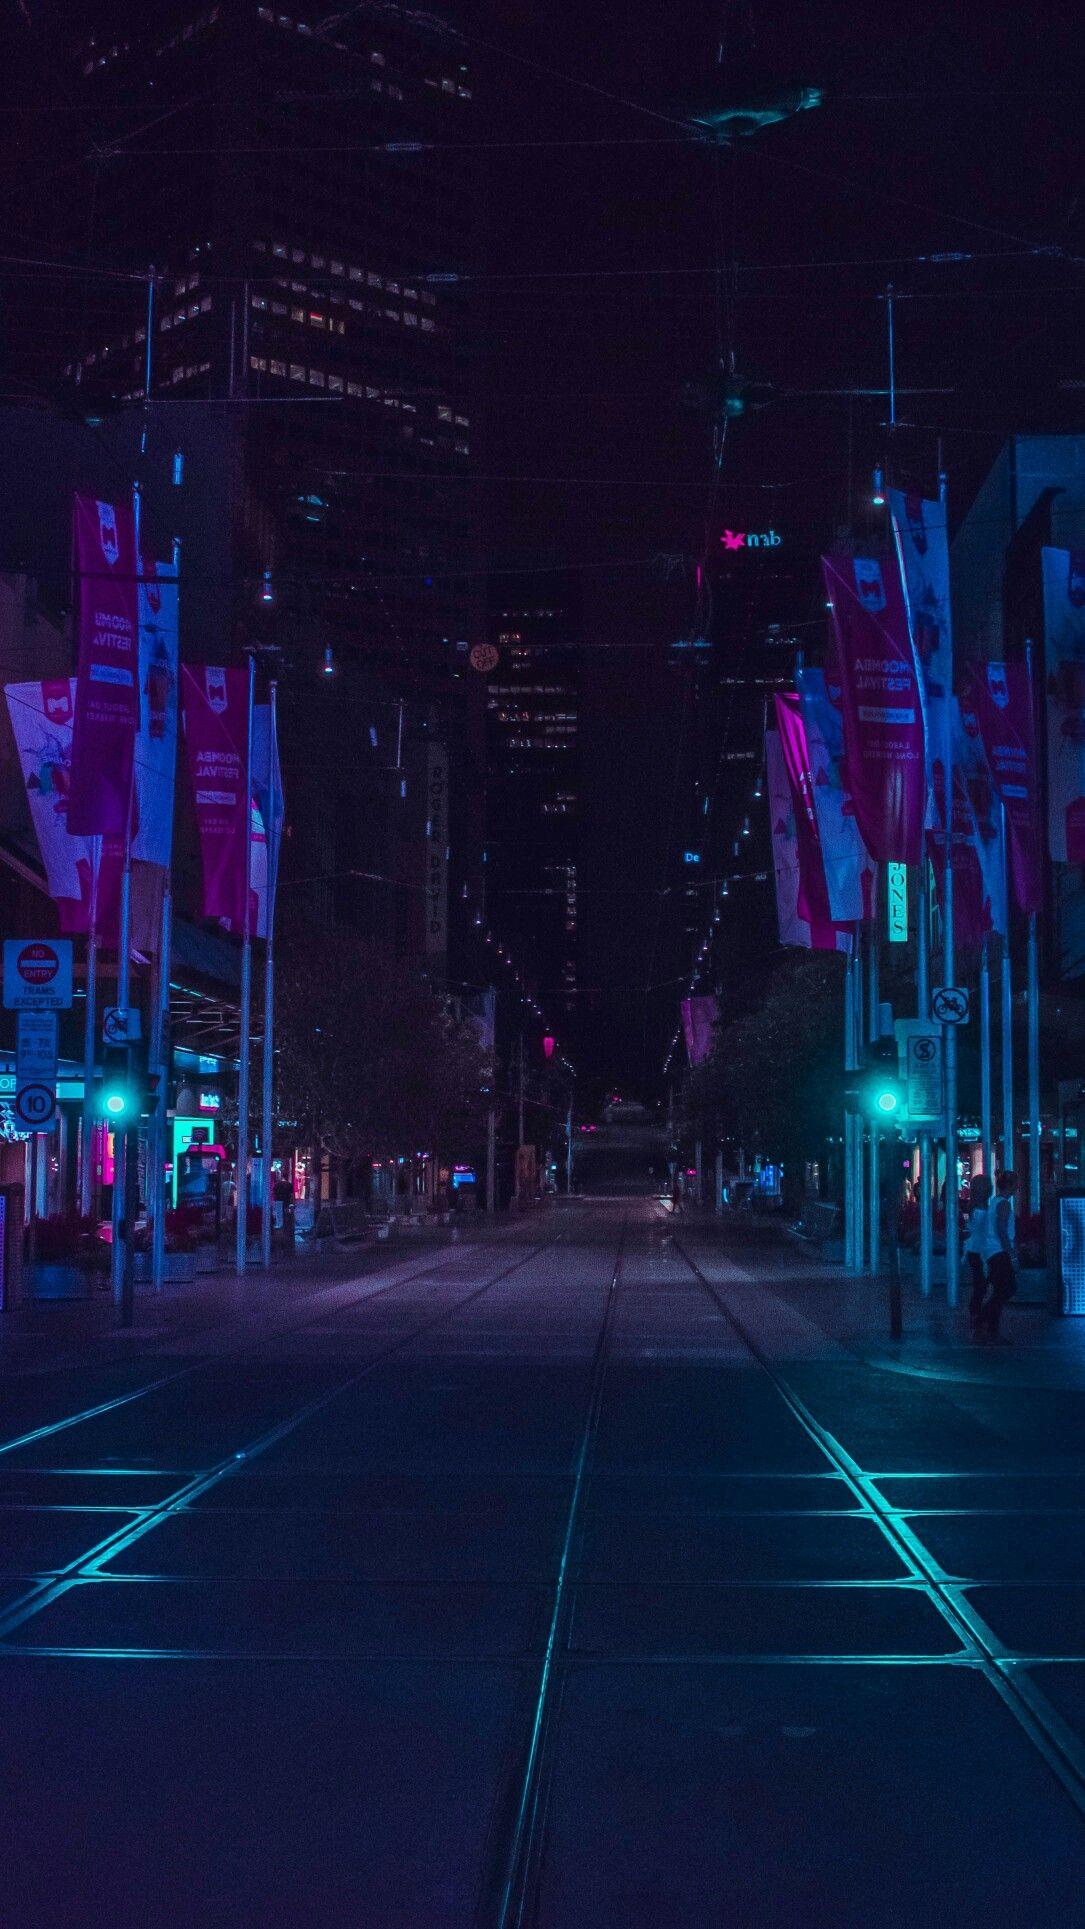 Pin by Iyan Sofyan on Light Of Life Neon aesthetic, Neon